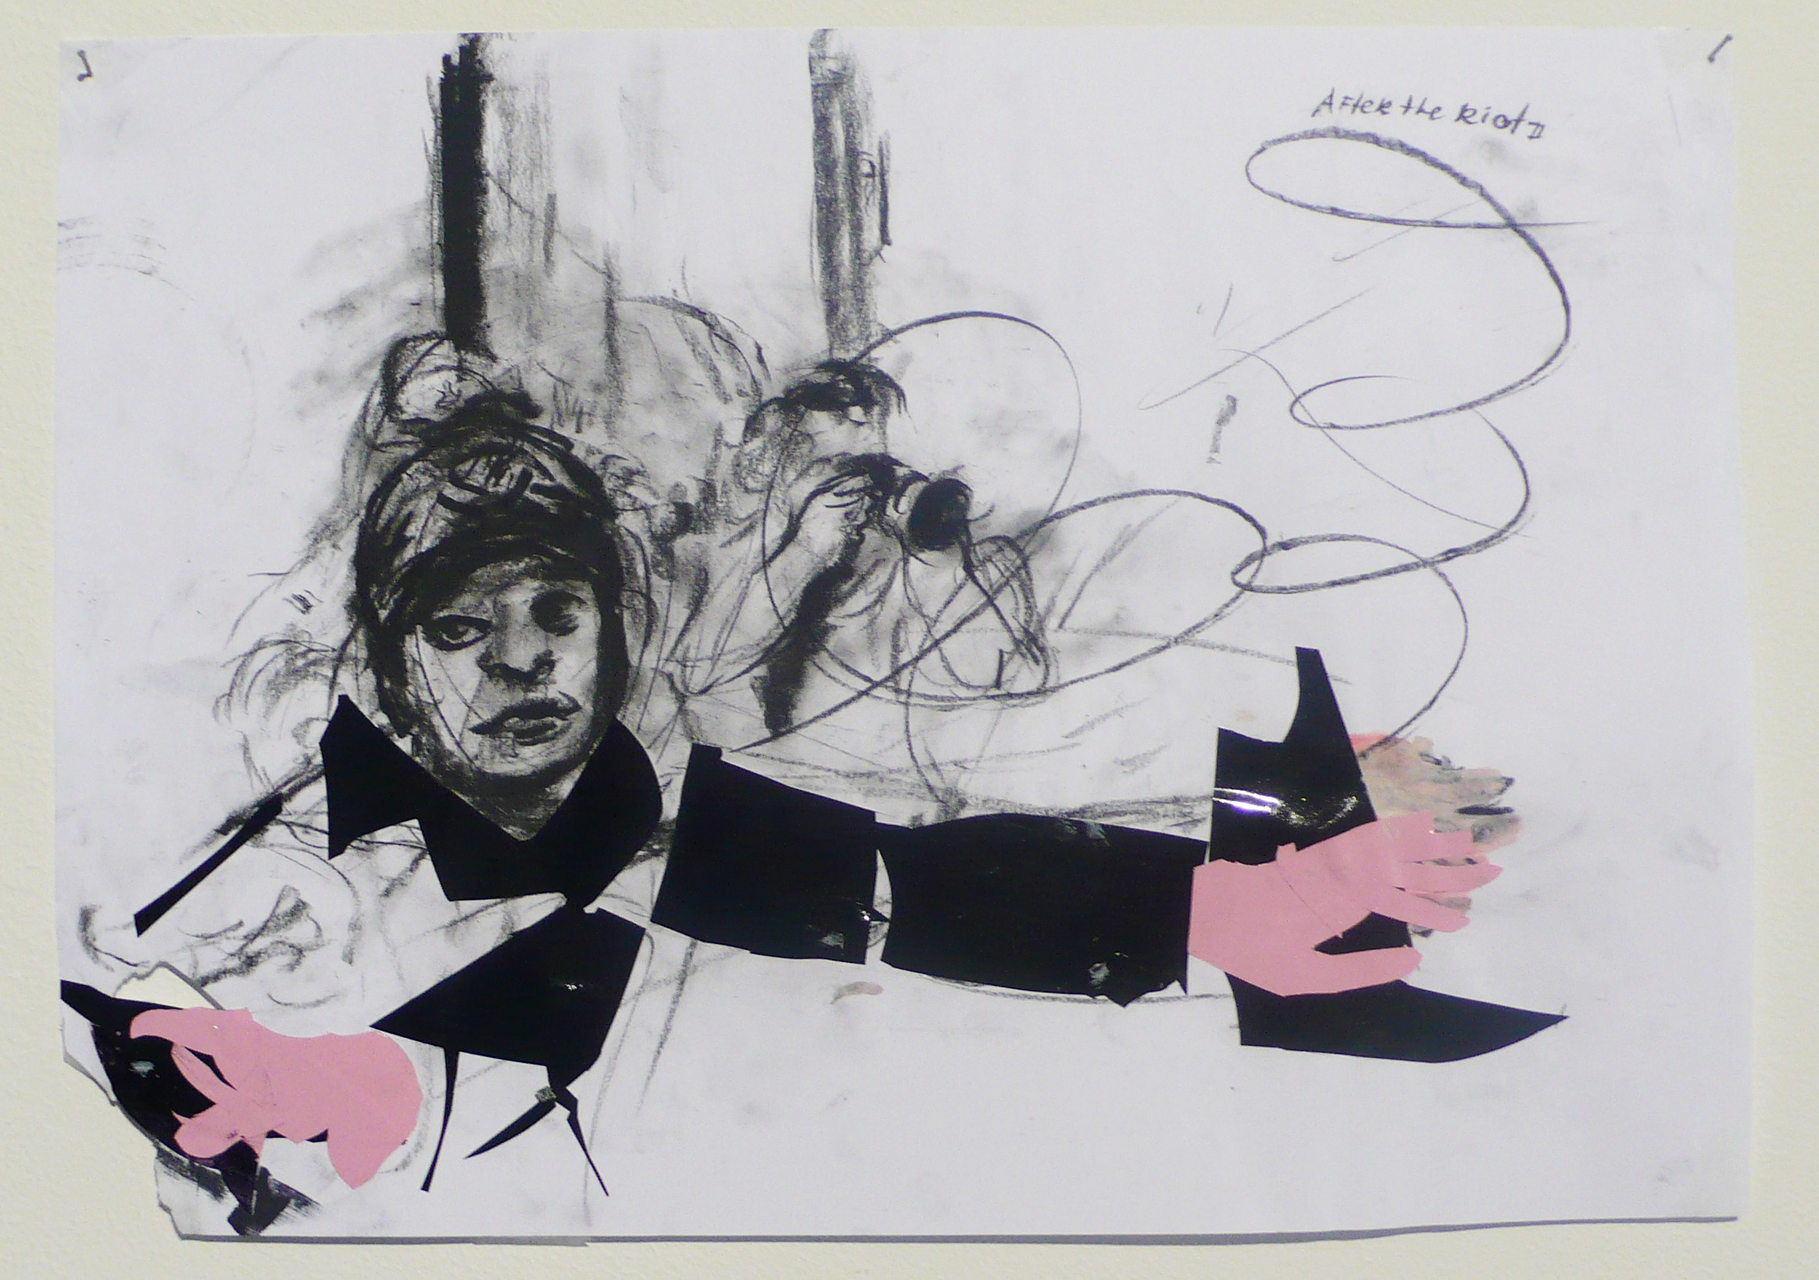 Erik van Lieshout_Untitled_Galerie Guido W. Baudach_P 82